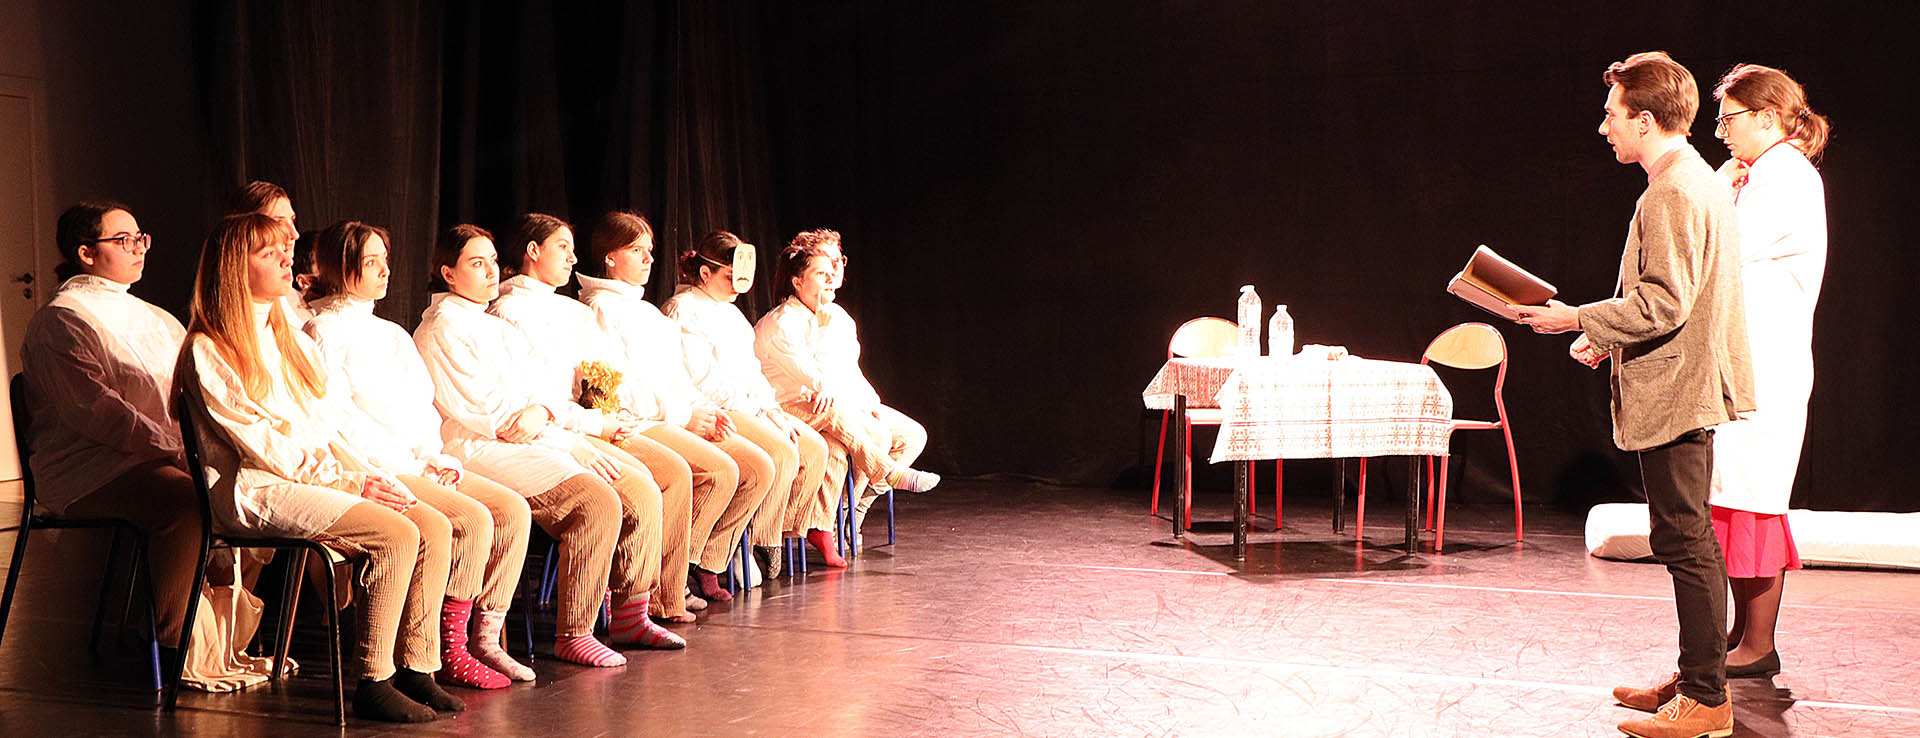 teatru saison france roumanie 2019 3